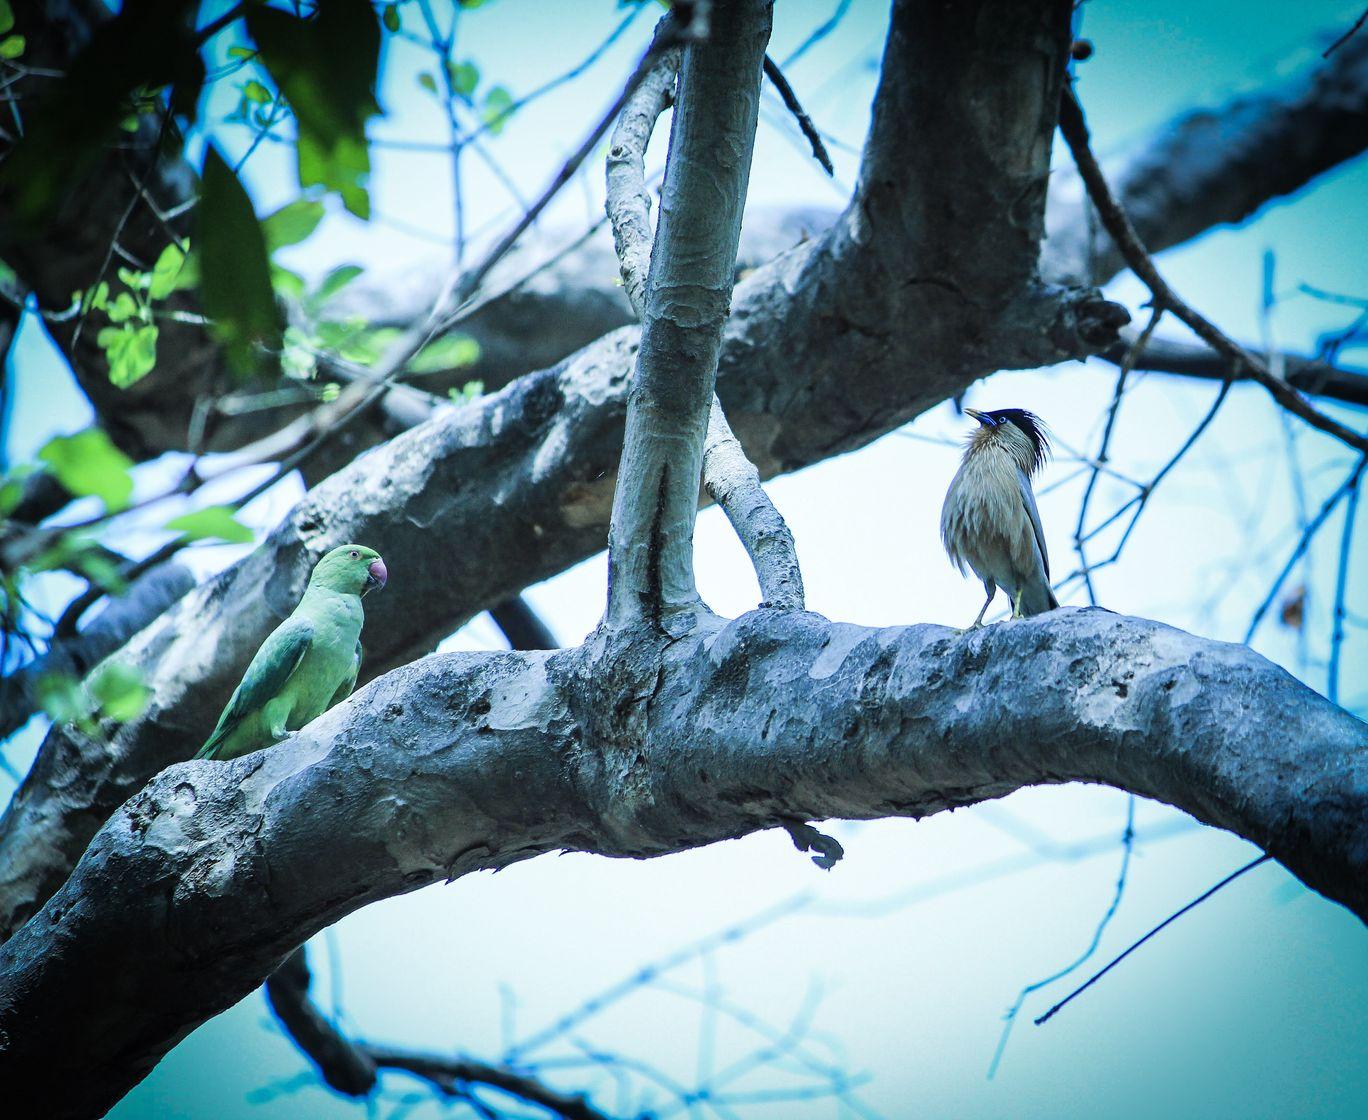 Photo of Bharatpur Bird Sanctuary By Rachit Tandon